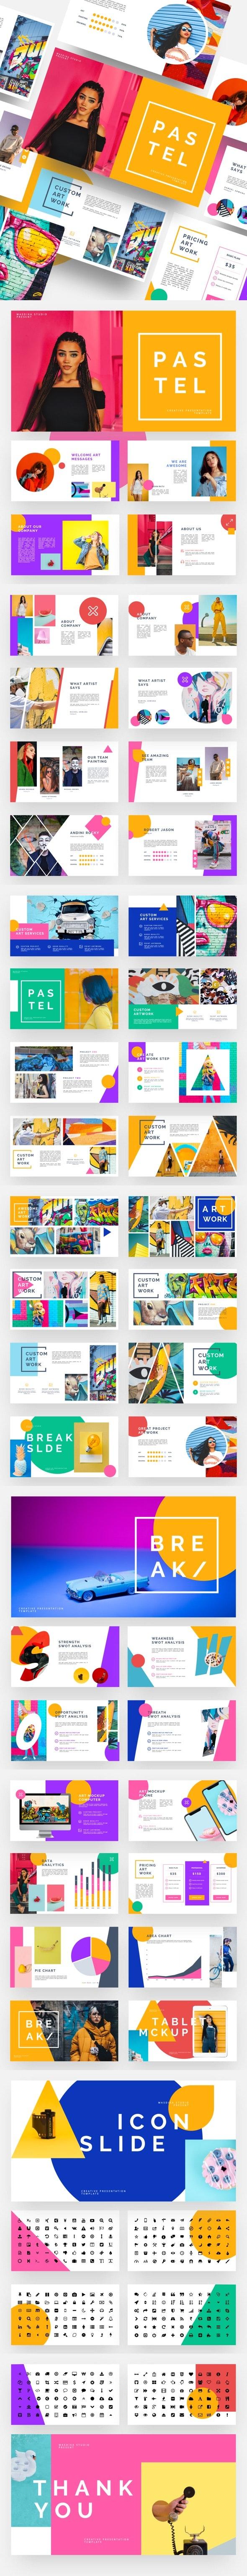 Pastel - Pop Art & Graffiti Keynote Template - Creative Keynote Templates